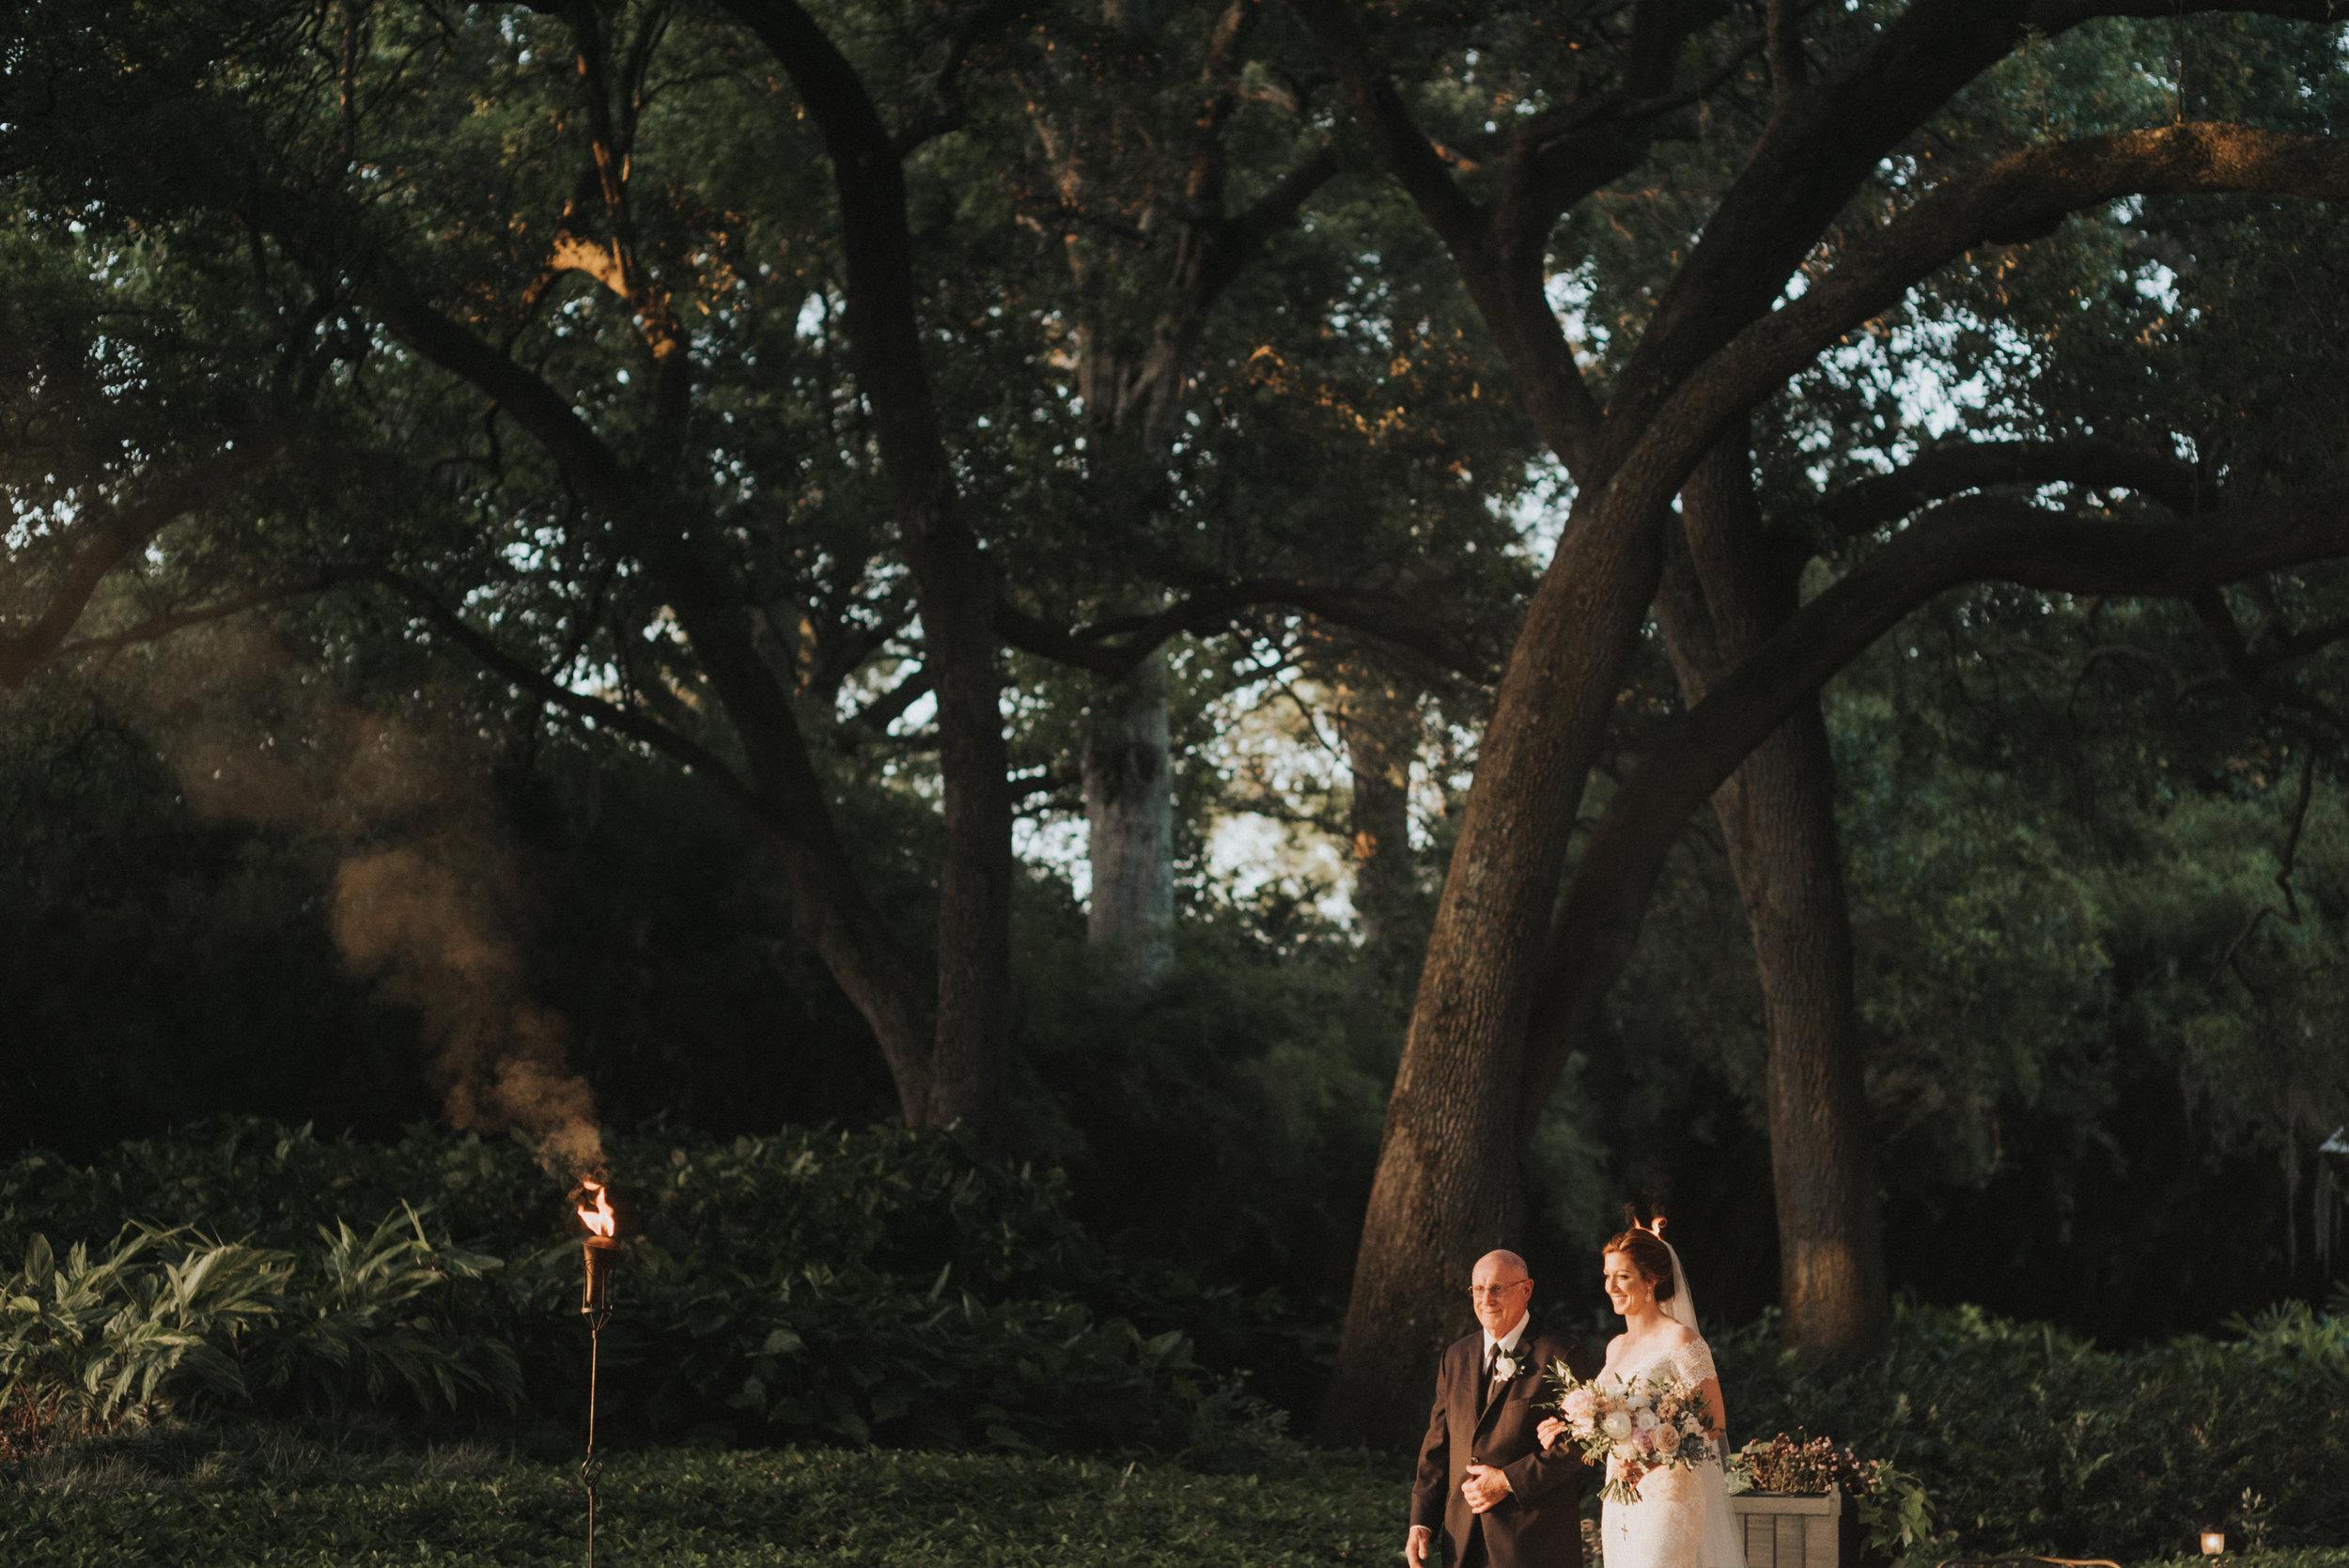 Southern Fete, Southern Wedding, Crystal Weddings, Bride entrance